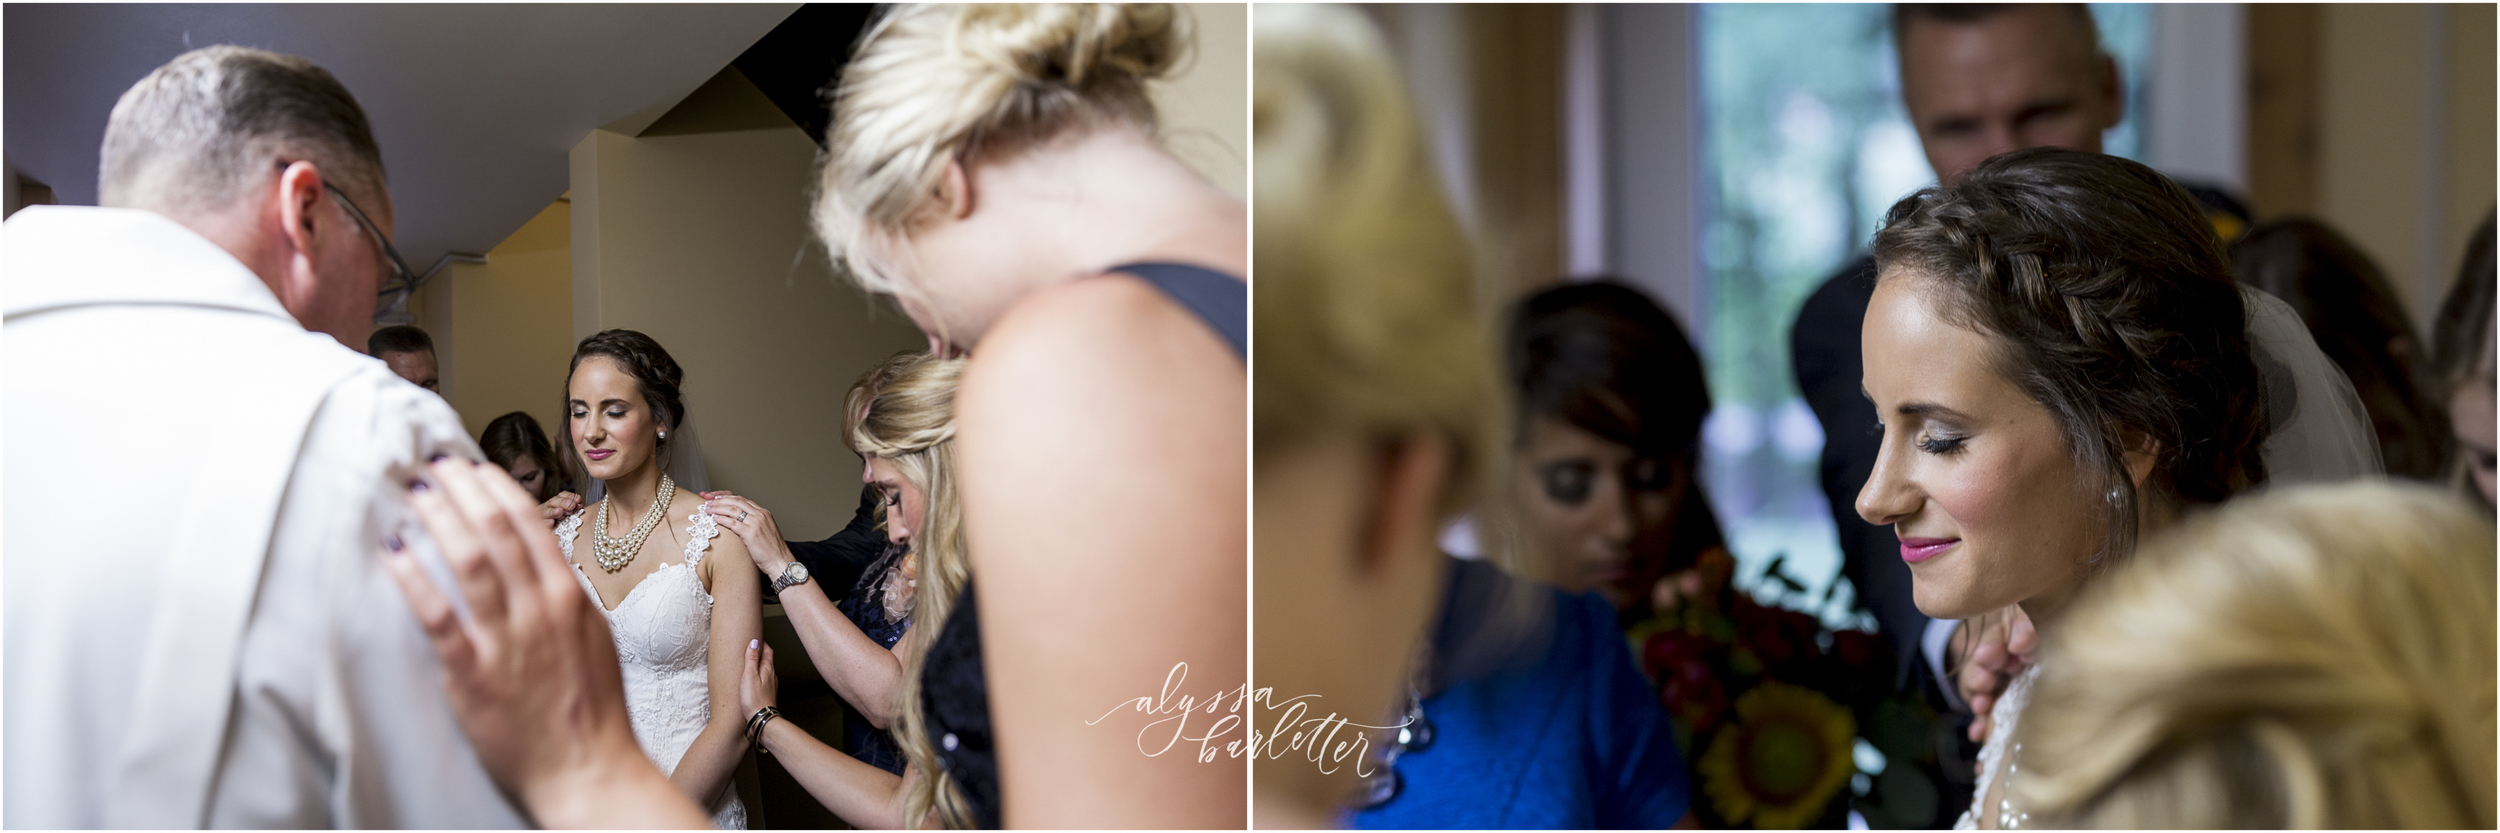 kansas city wedding budget mahaffie ceremony prayer